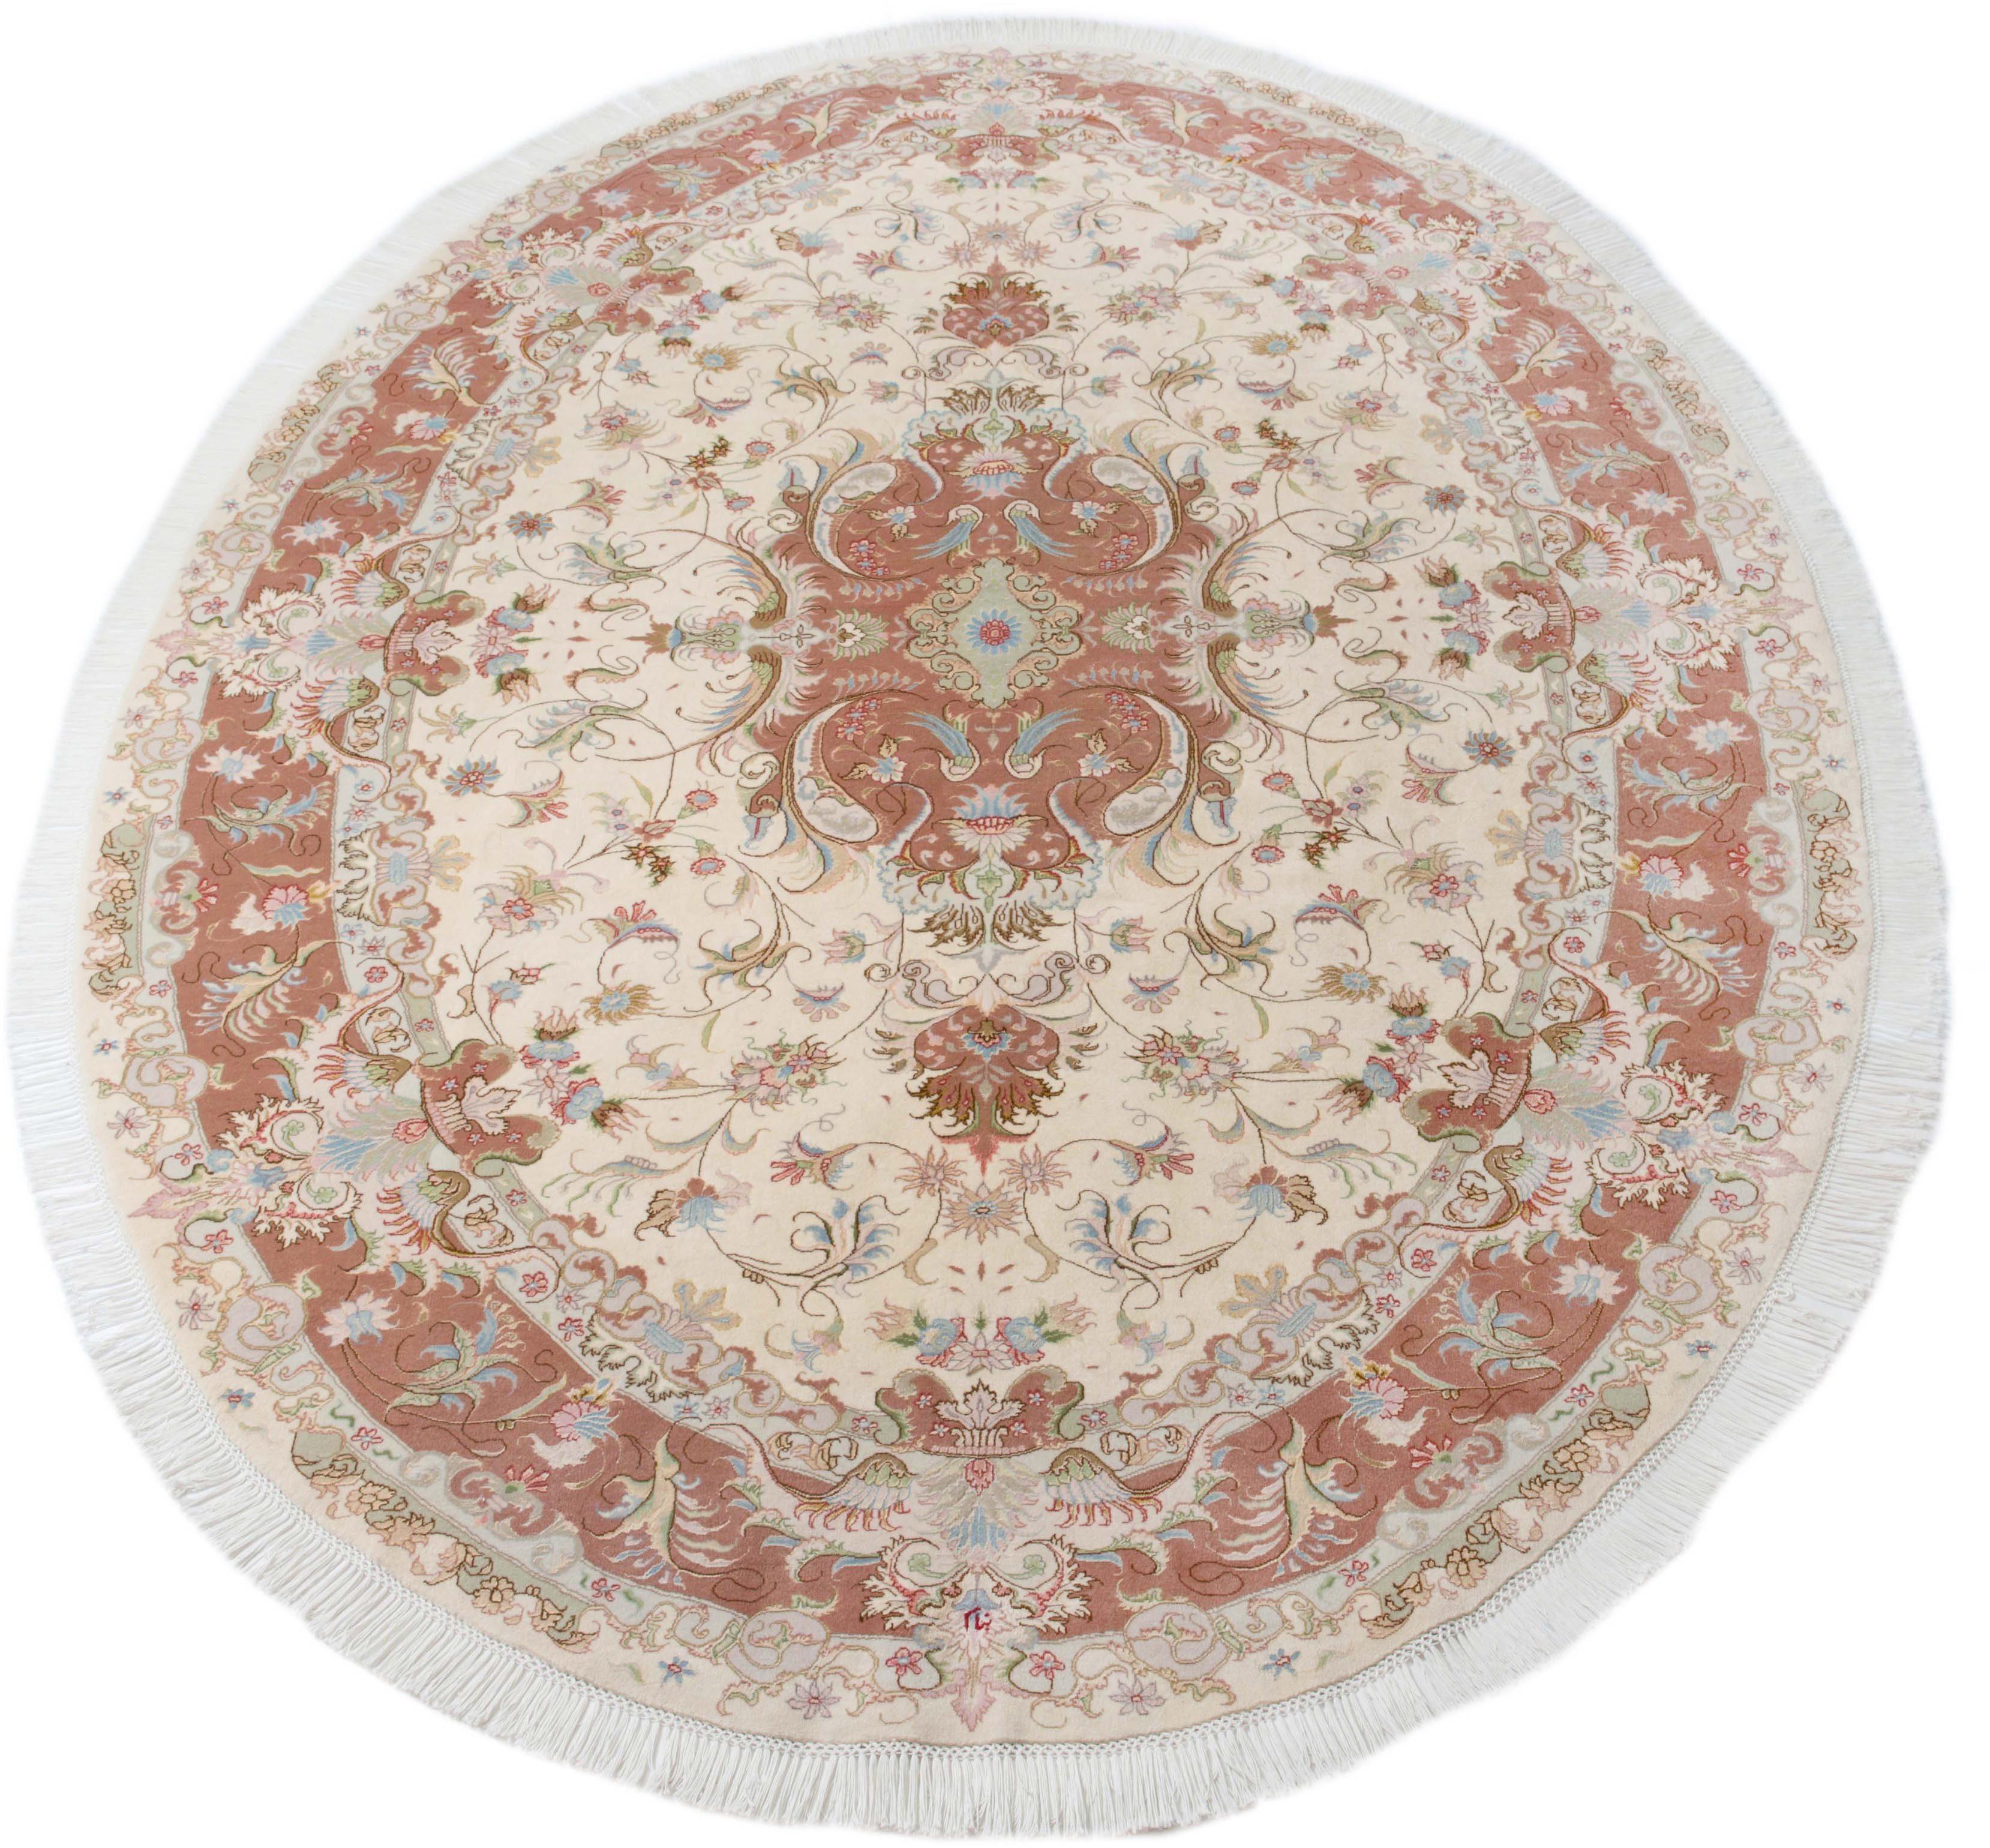 Orient-Teppich, Parwis, »Tabris Banam«, handgeknüpft, Seiden Anteil, 700 000 Knoten/m², Unikat